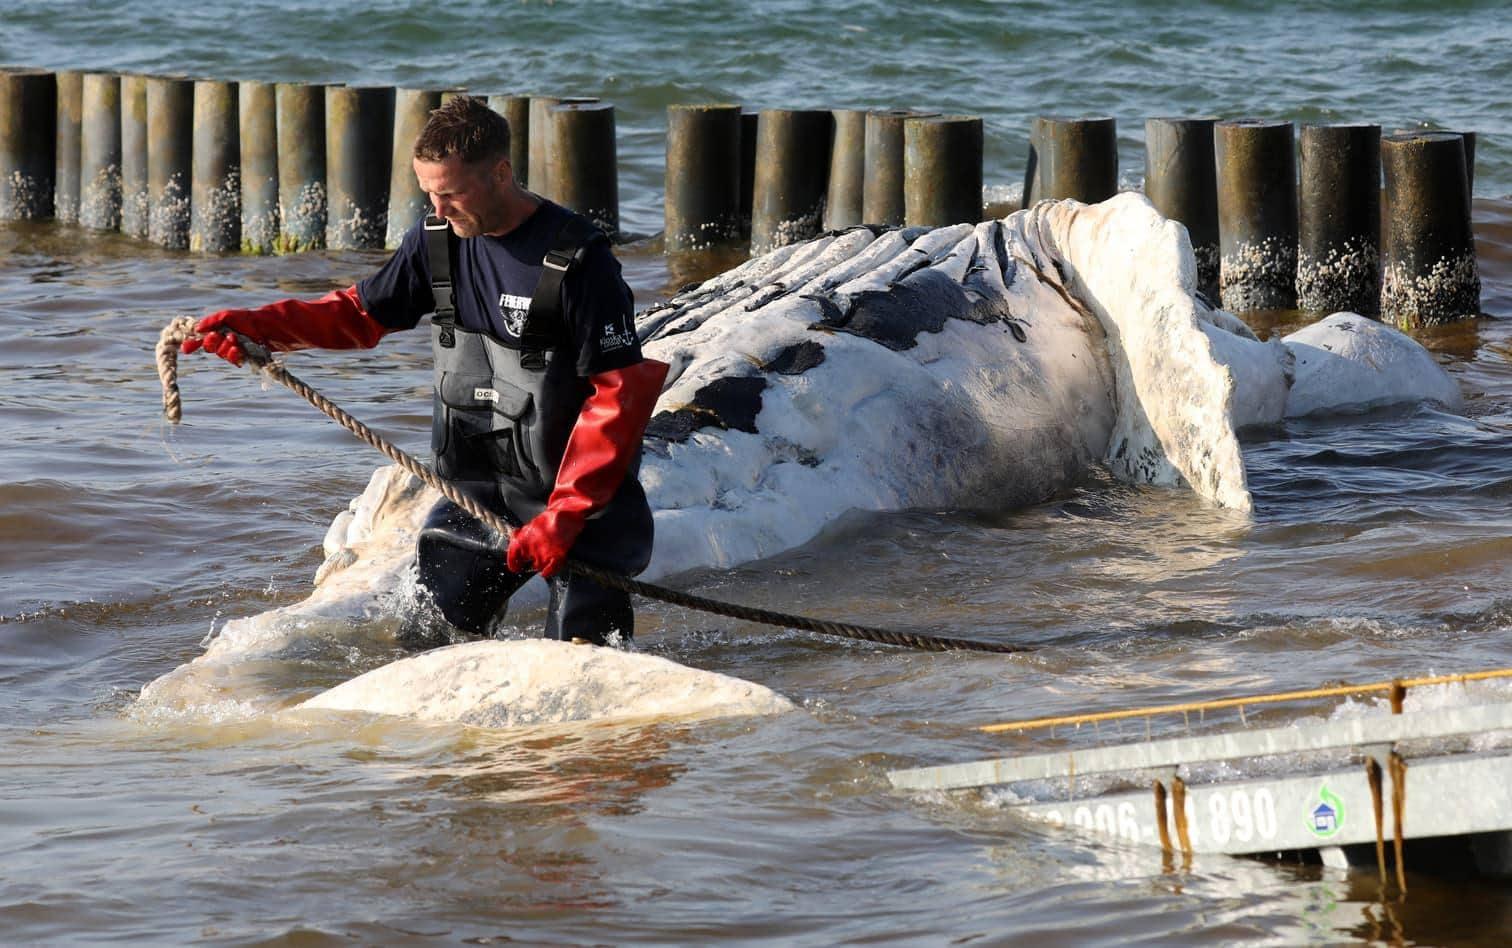 <p>Normalerweise leben Buckelwale im Atlantik</p> Foto: dpa